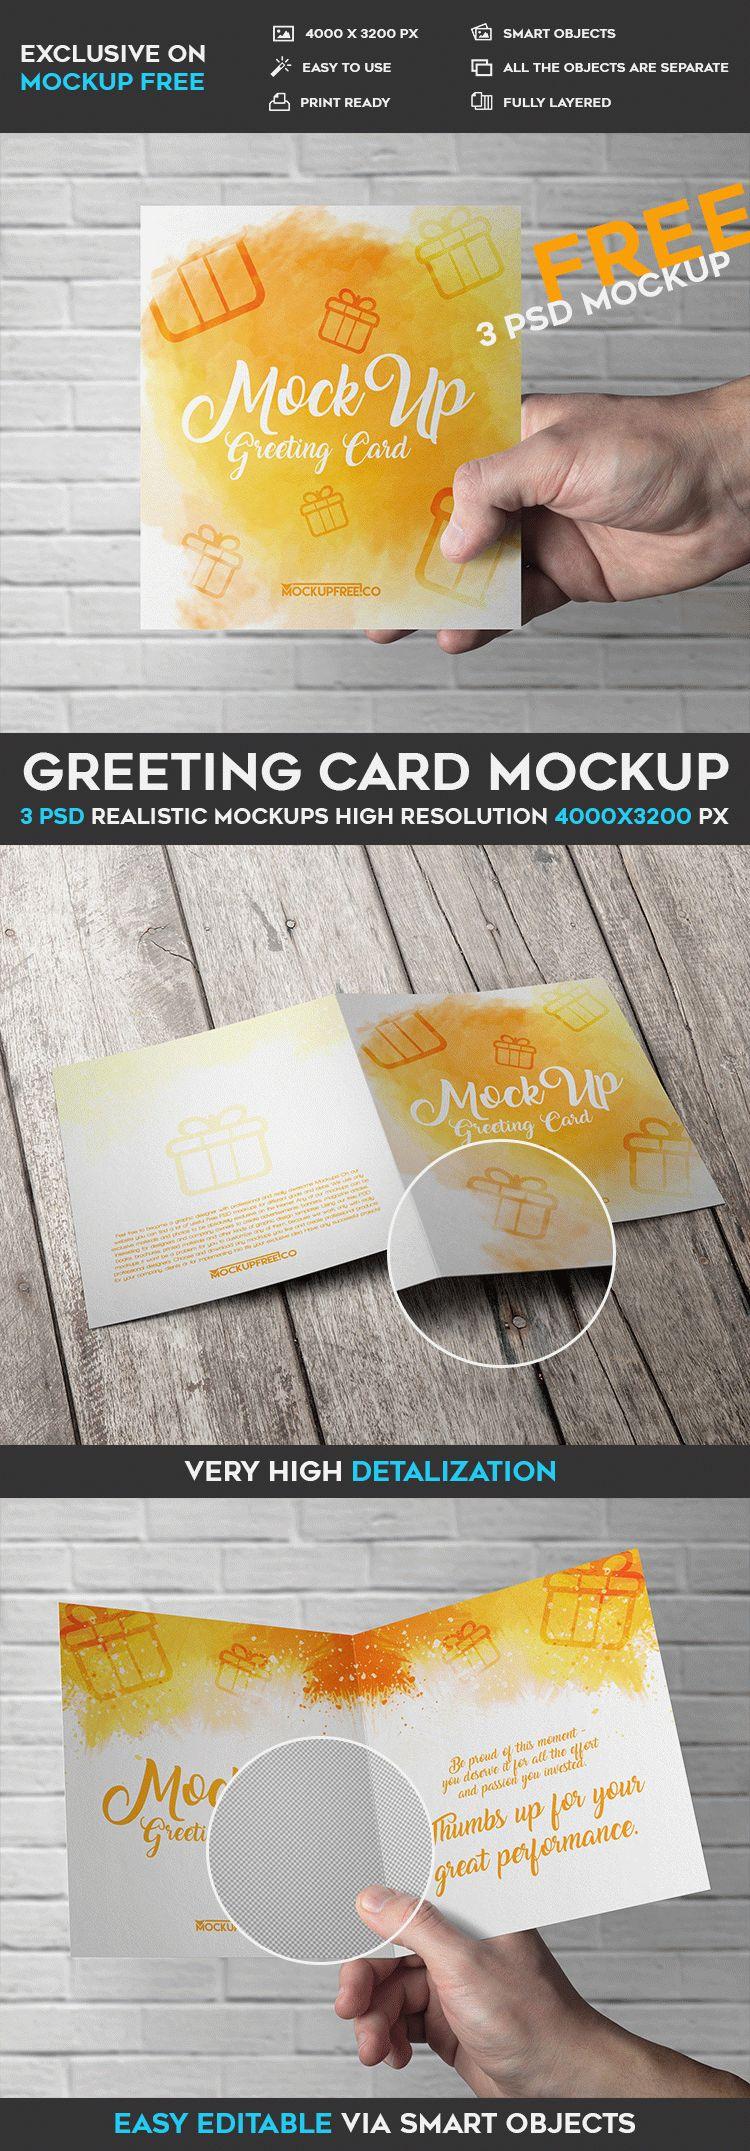 Greeting Card 3 Free Psd Mockups Free Psd Templates